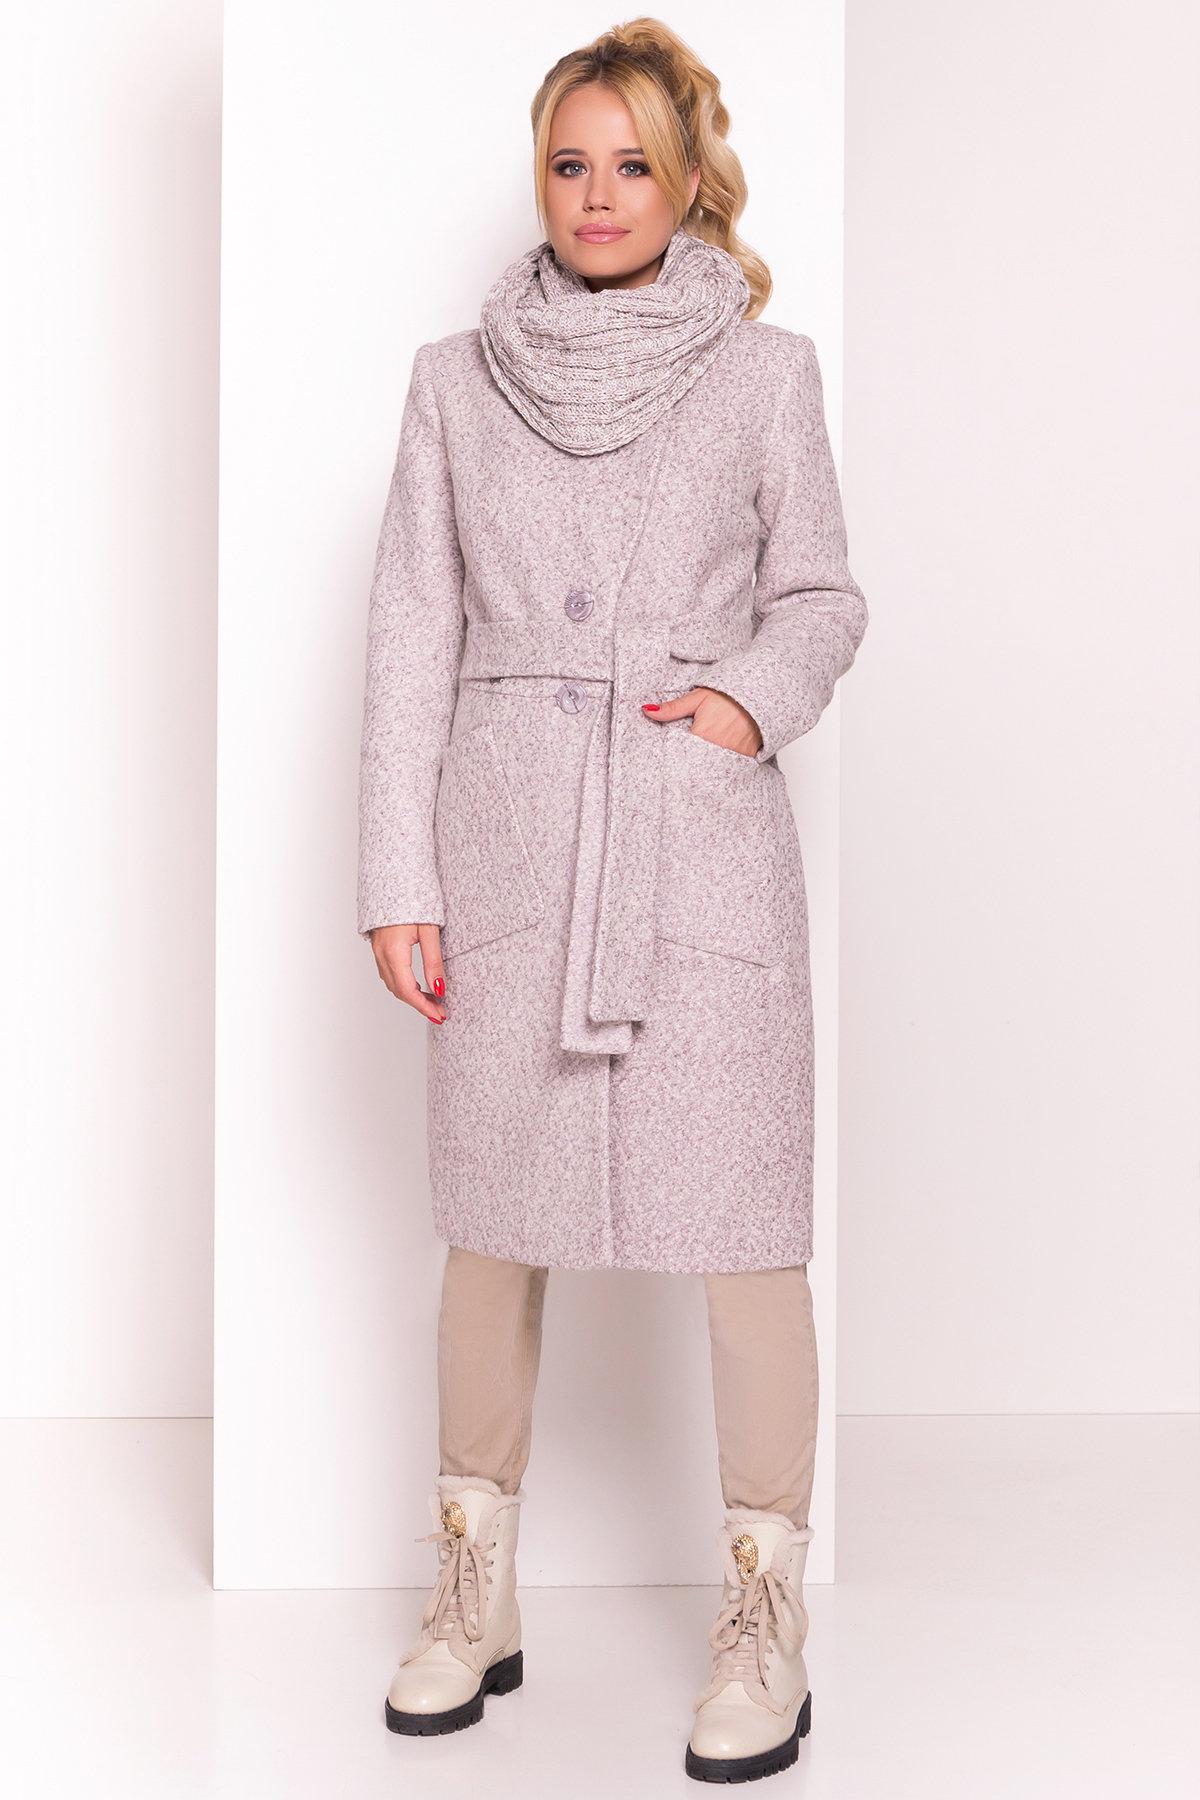 Пальто Габриэлла 4153 АРТ. 20309 Цвет: Серый/бежевый - фото 4, интернет магазин tm-modus.ru